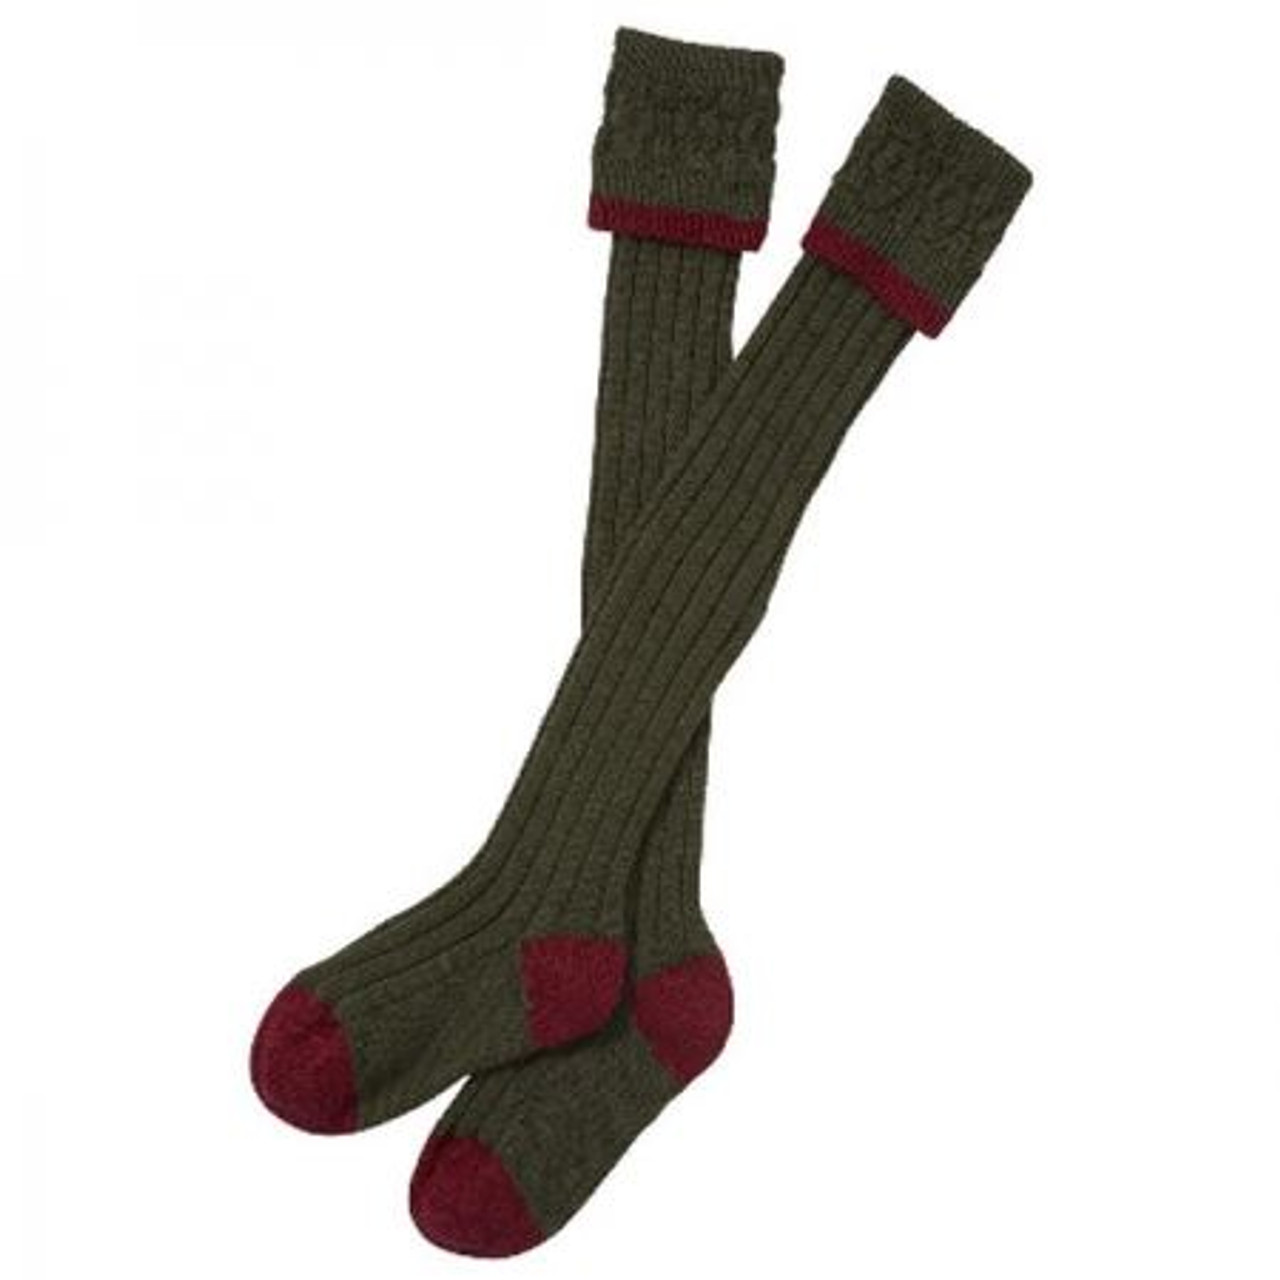 Barbour Socks Contrast Stocking Gun Socks